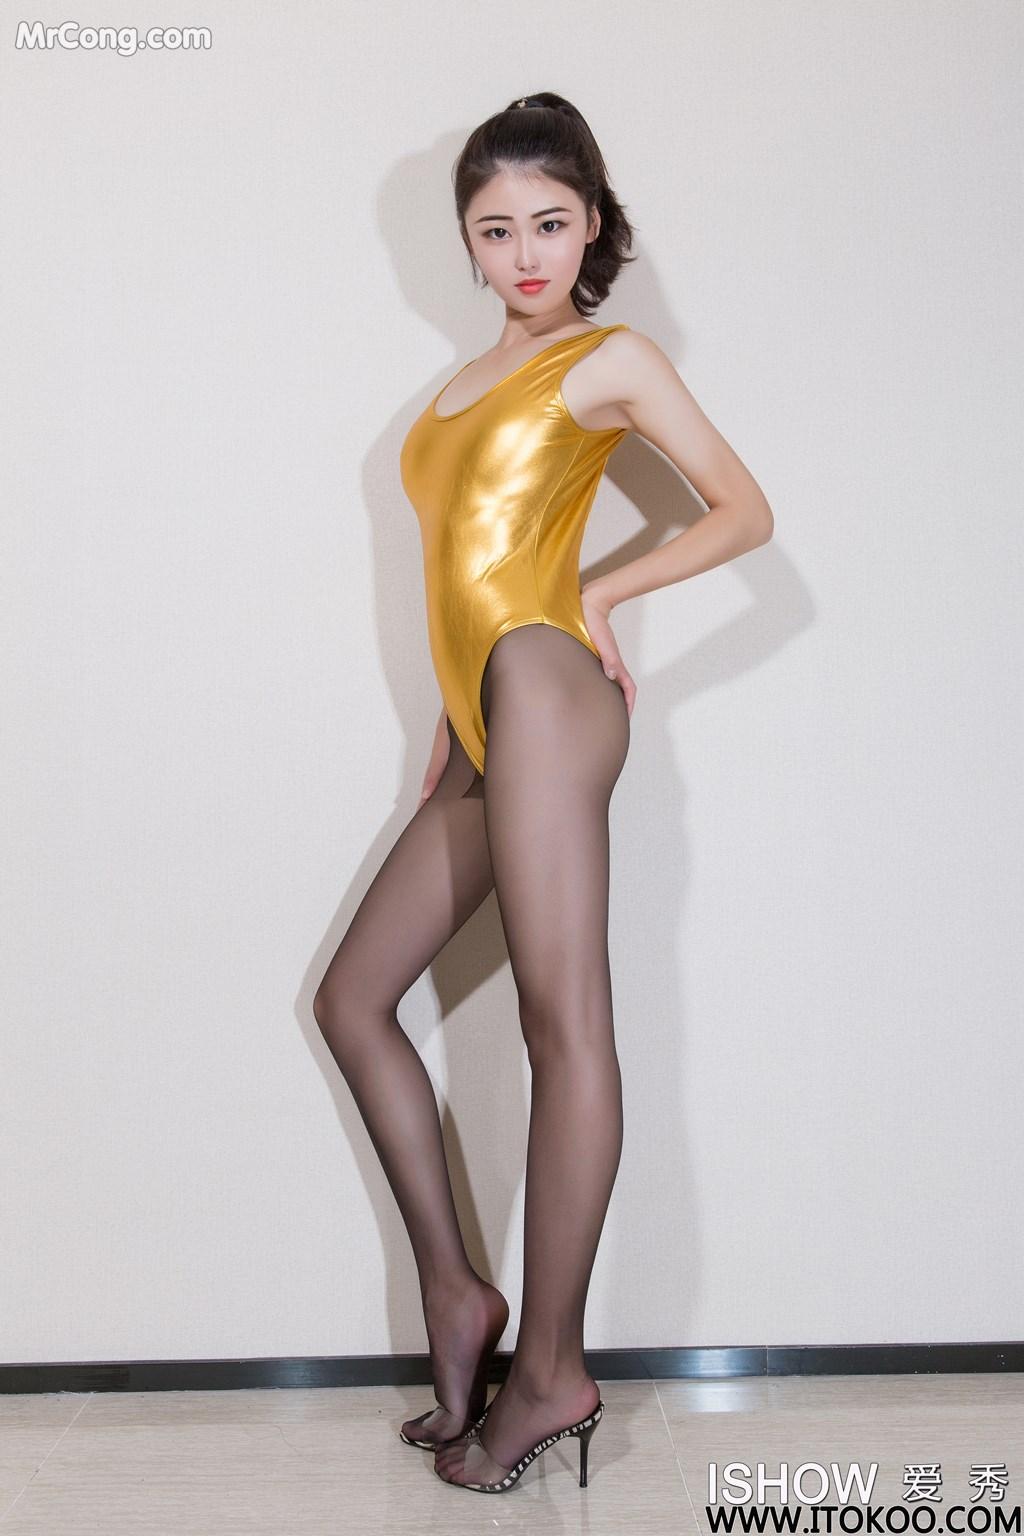 Image ISHOW-No.169-Liu-Yue-Fei-Phoebe-MrCong.com-001 in post ISHOW No.169: Người mẫu Liu Yue Fei (刘玥菲Phoebe) (31 ảnh)